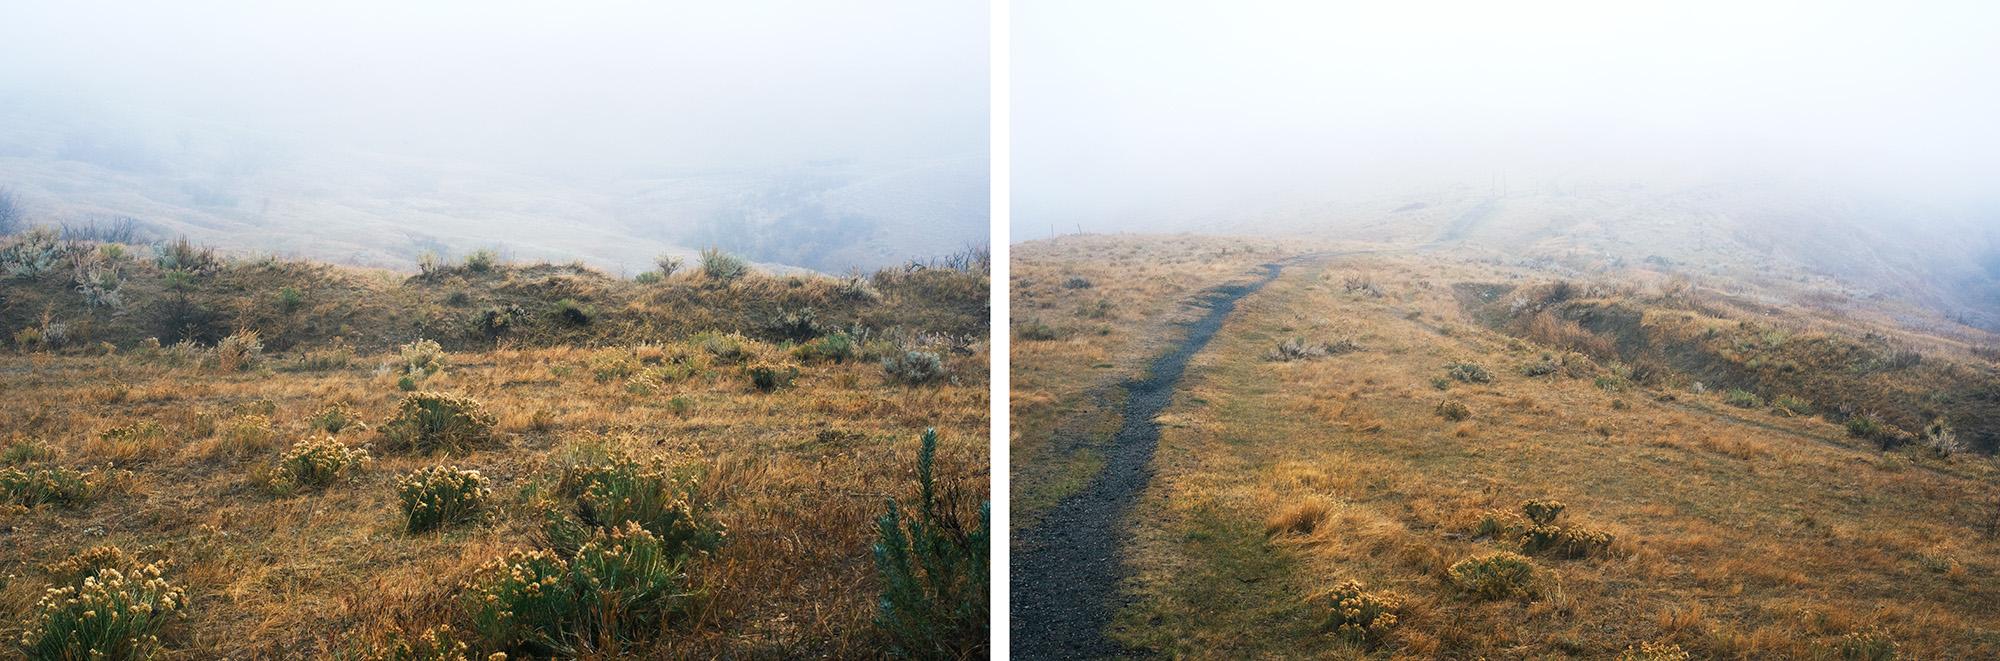 Deborah_Farnault_Wyoming_Fetterman_Trail_Fog_montage.jpg